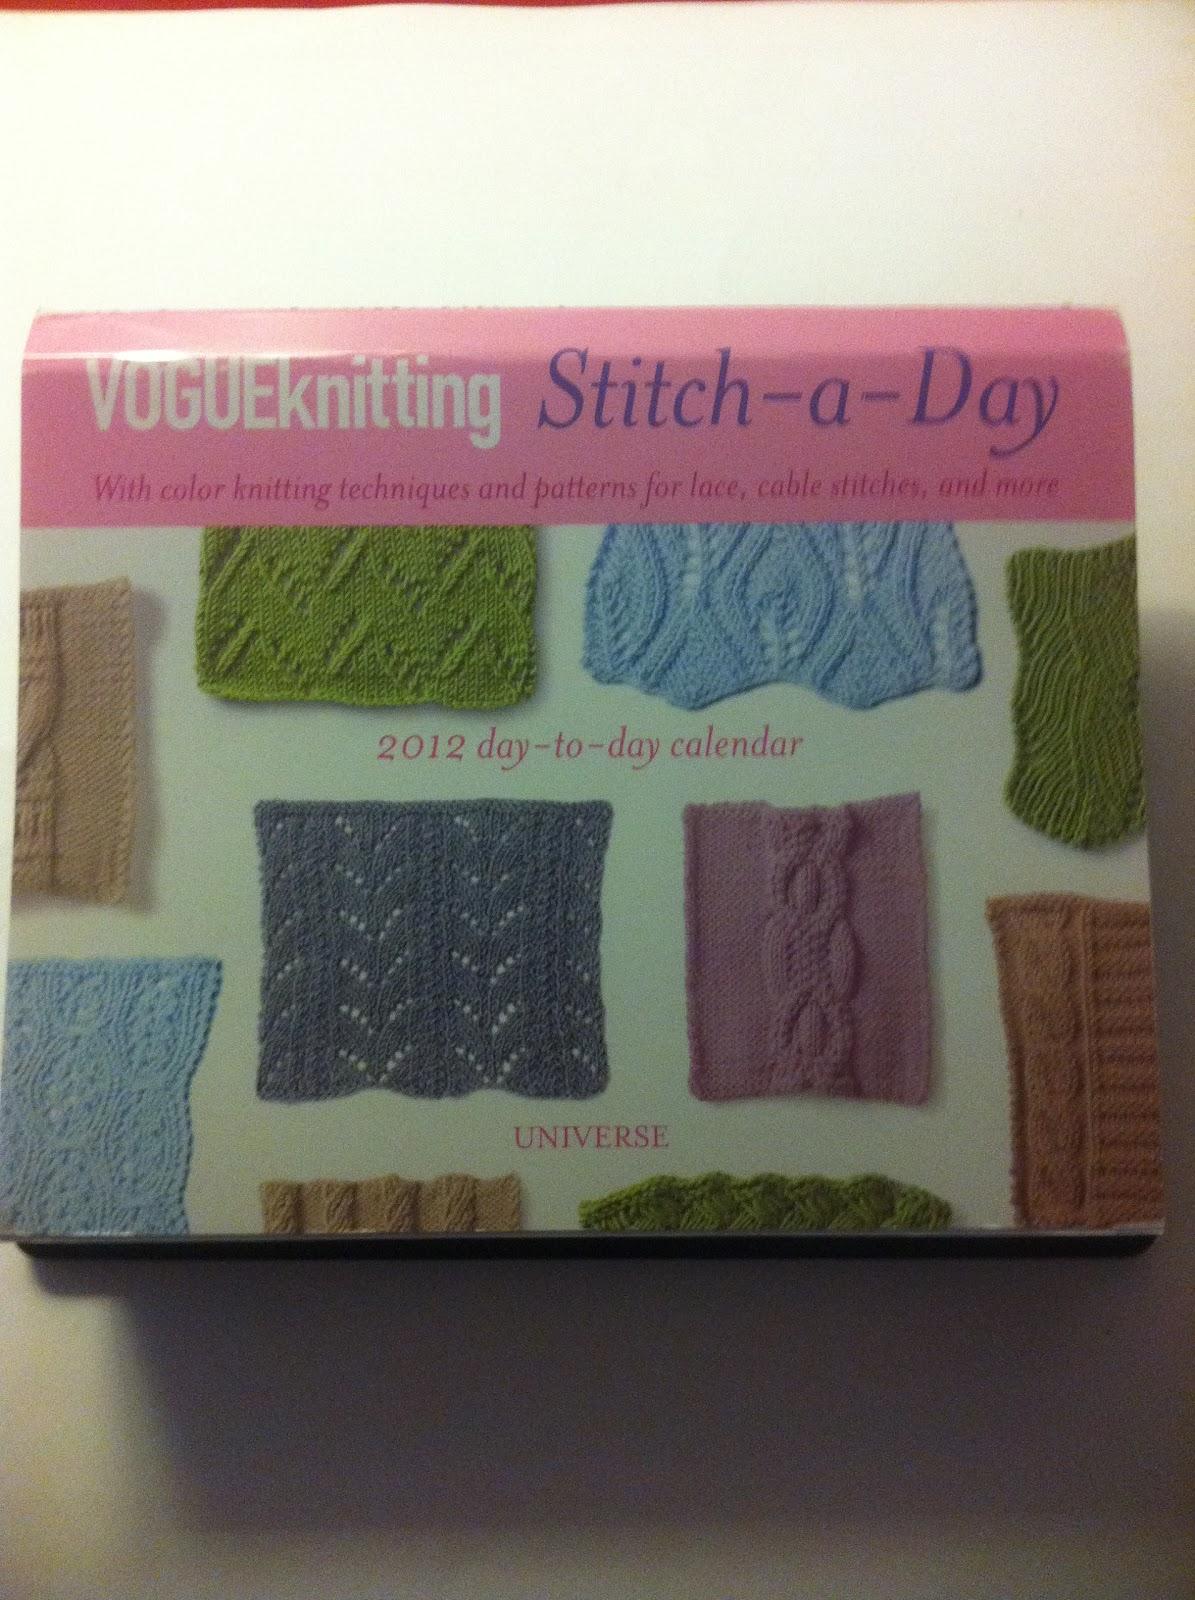 Jenns Yarn Addiction: Vogue Knitting Stitch a Day Calendar!